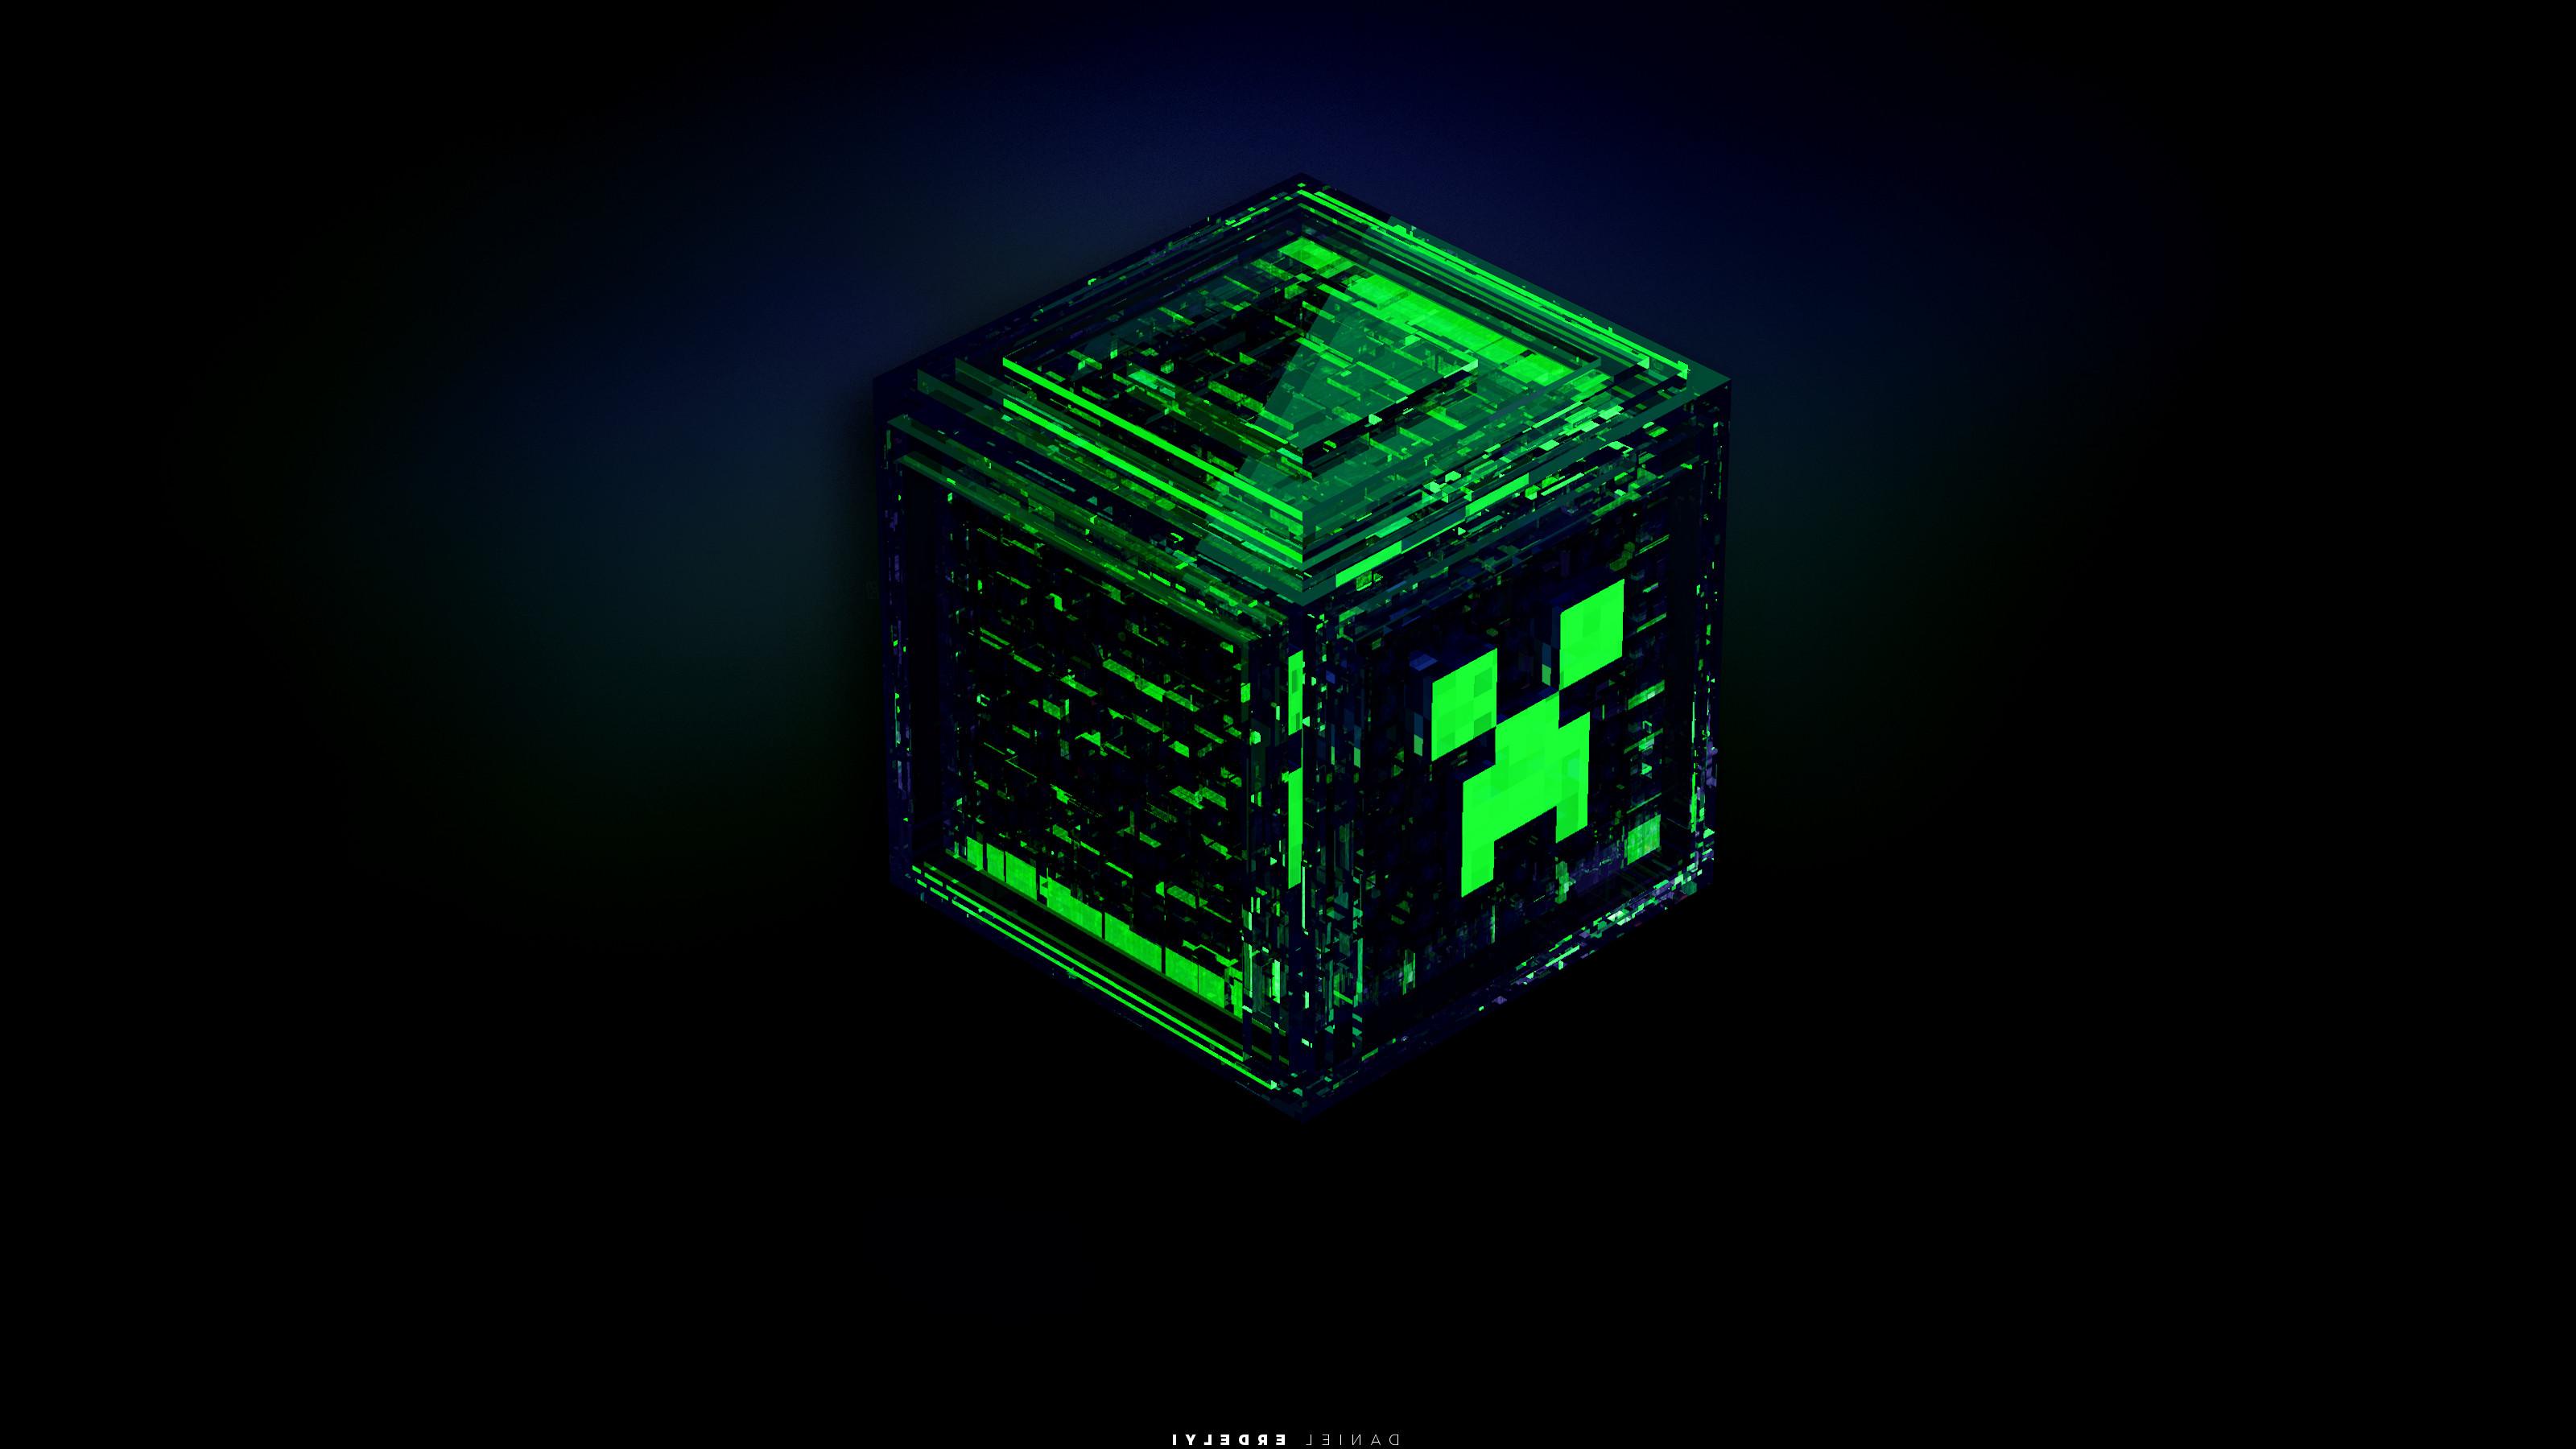 Fantastic Wallpaper Minecraft Enderman - 706227-most-popular-minecraft-desktop-backgrounds-3200x1800-720p  Collection_734850.jpg